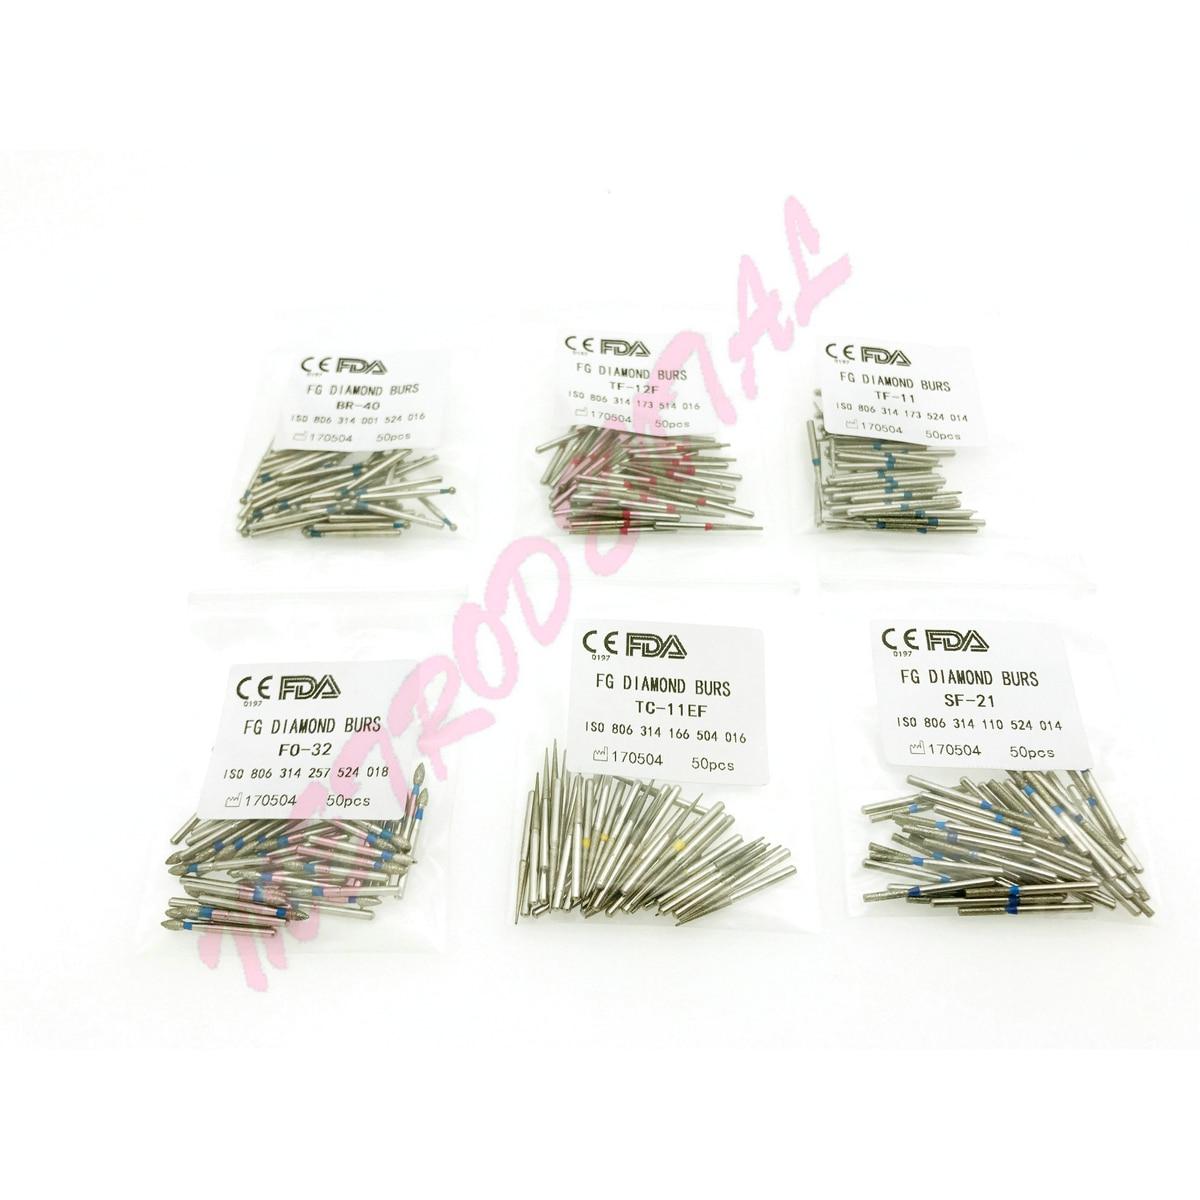 50pcs Dental  FG High Speed Diamond Burs for Polishing Dental Burs 1.6mm free shipping 6pcs box flywheel drilling burs jewellery bur tools suppliers diamond burs for polishing